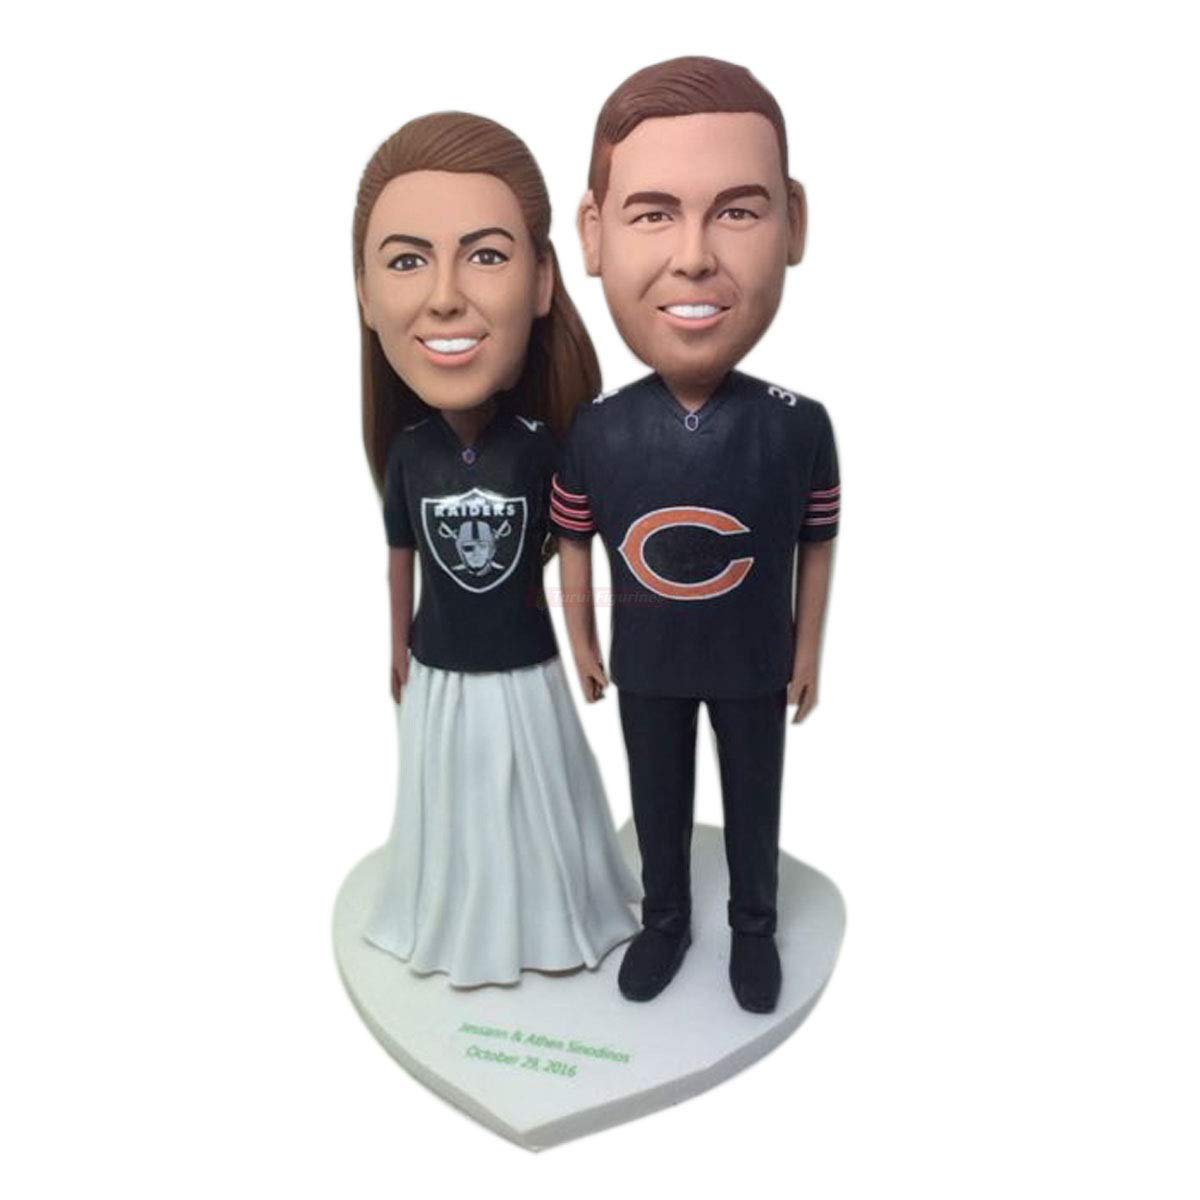 Amazon Com Oakland Raiders Chicago Bears Fan Personalized Wedding Cake Topper Custom Bobble Head Figurine Based On Customers Photos Wedding Gift Handmade